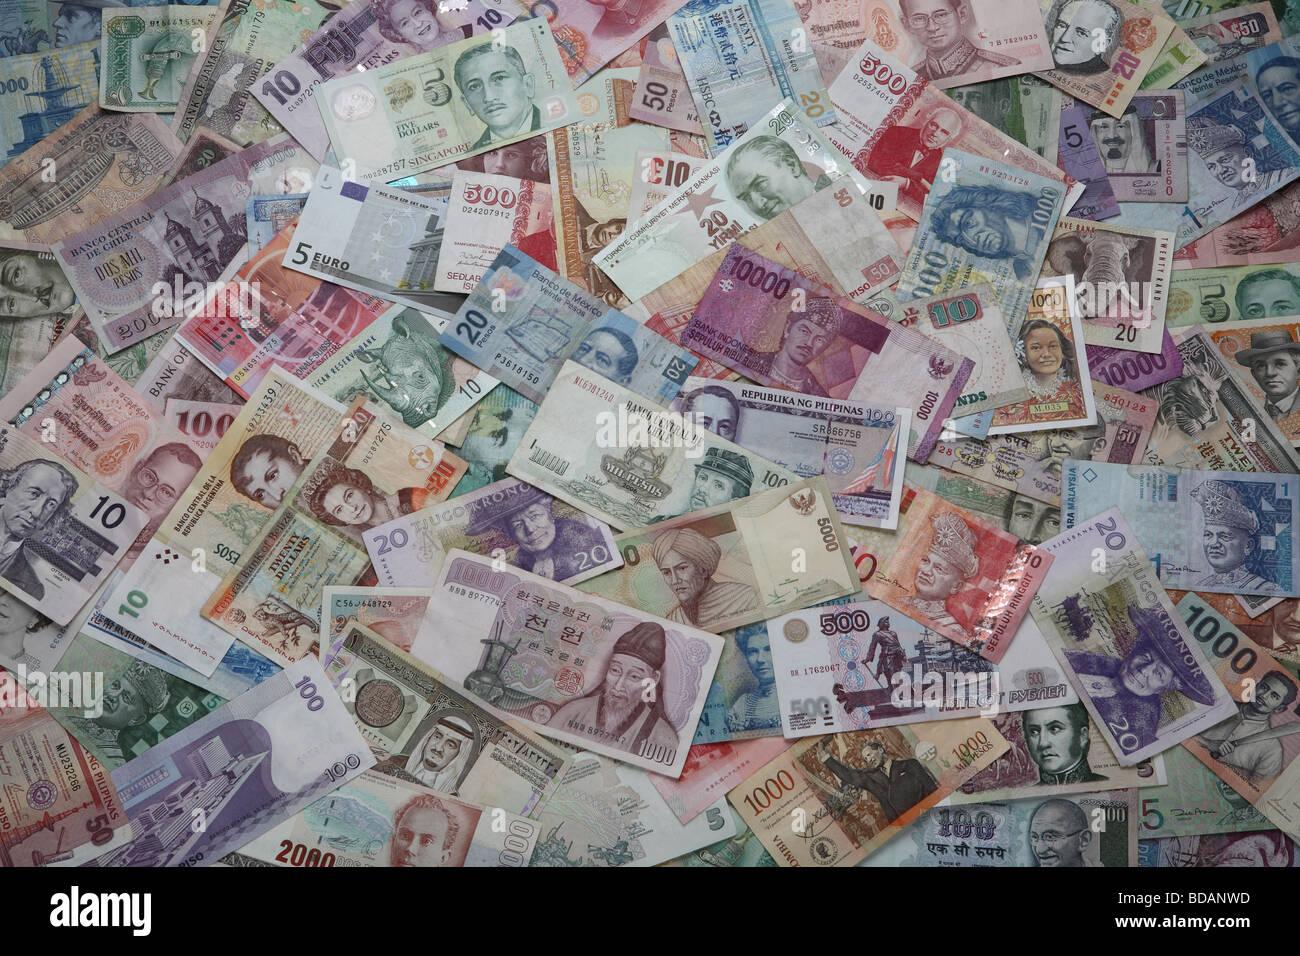 An arrangement of various international currencies. - Stock Image